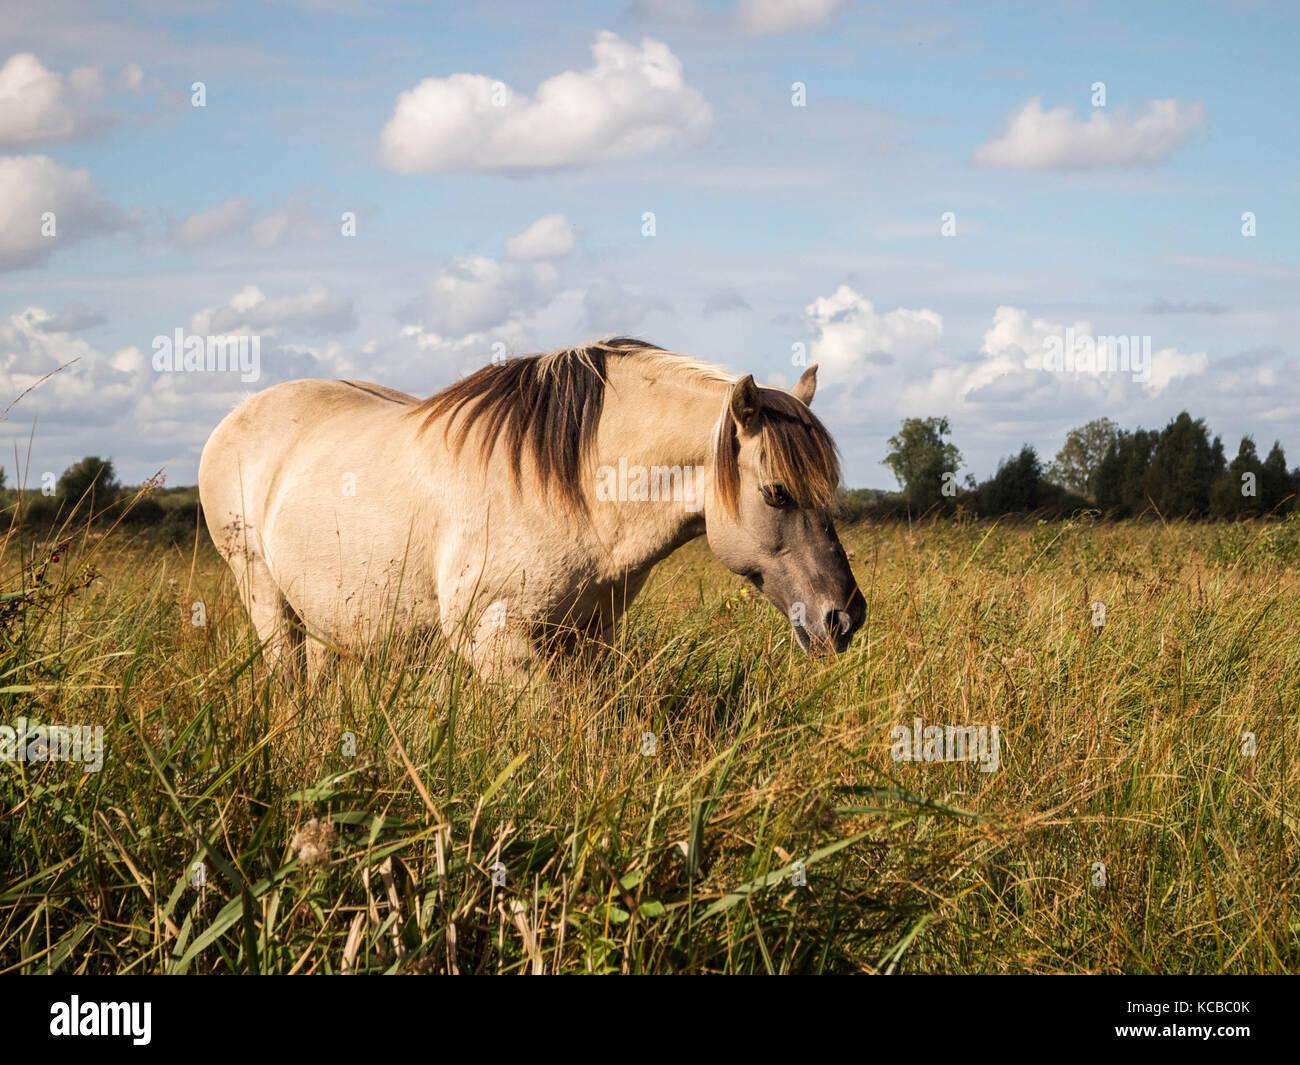 Konik Stallion Grazing on Wicken Fen - Stock Image